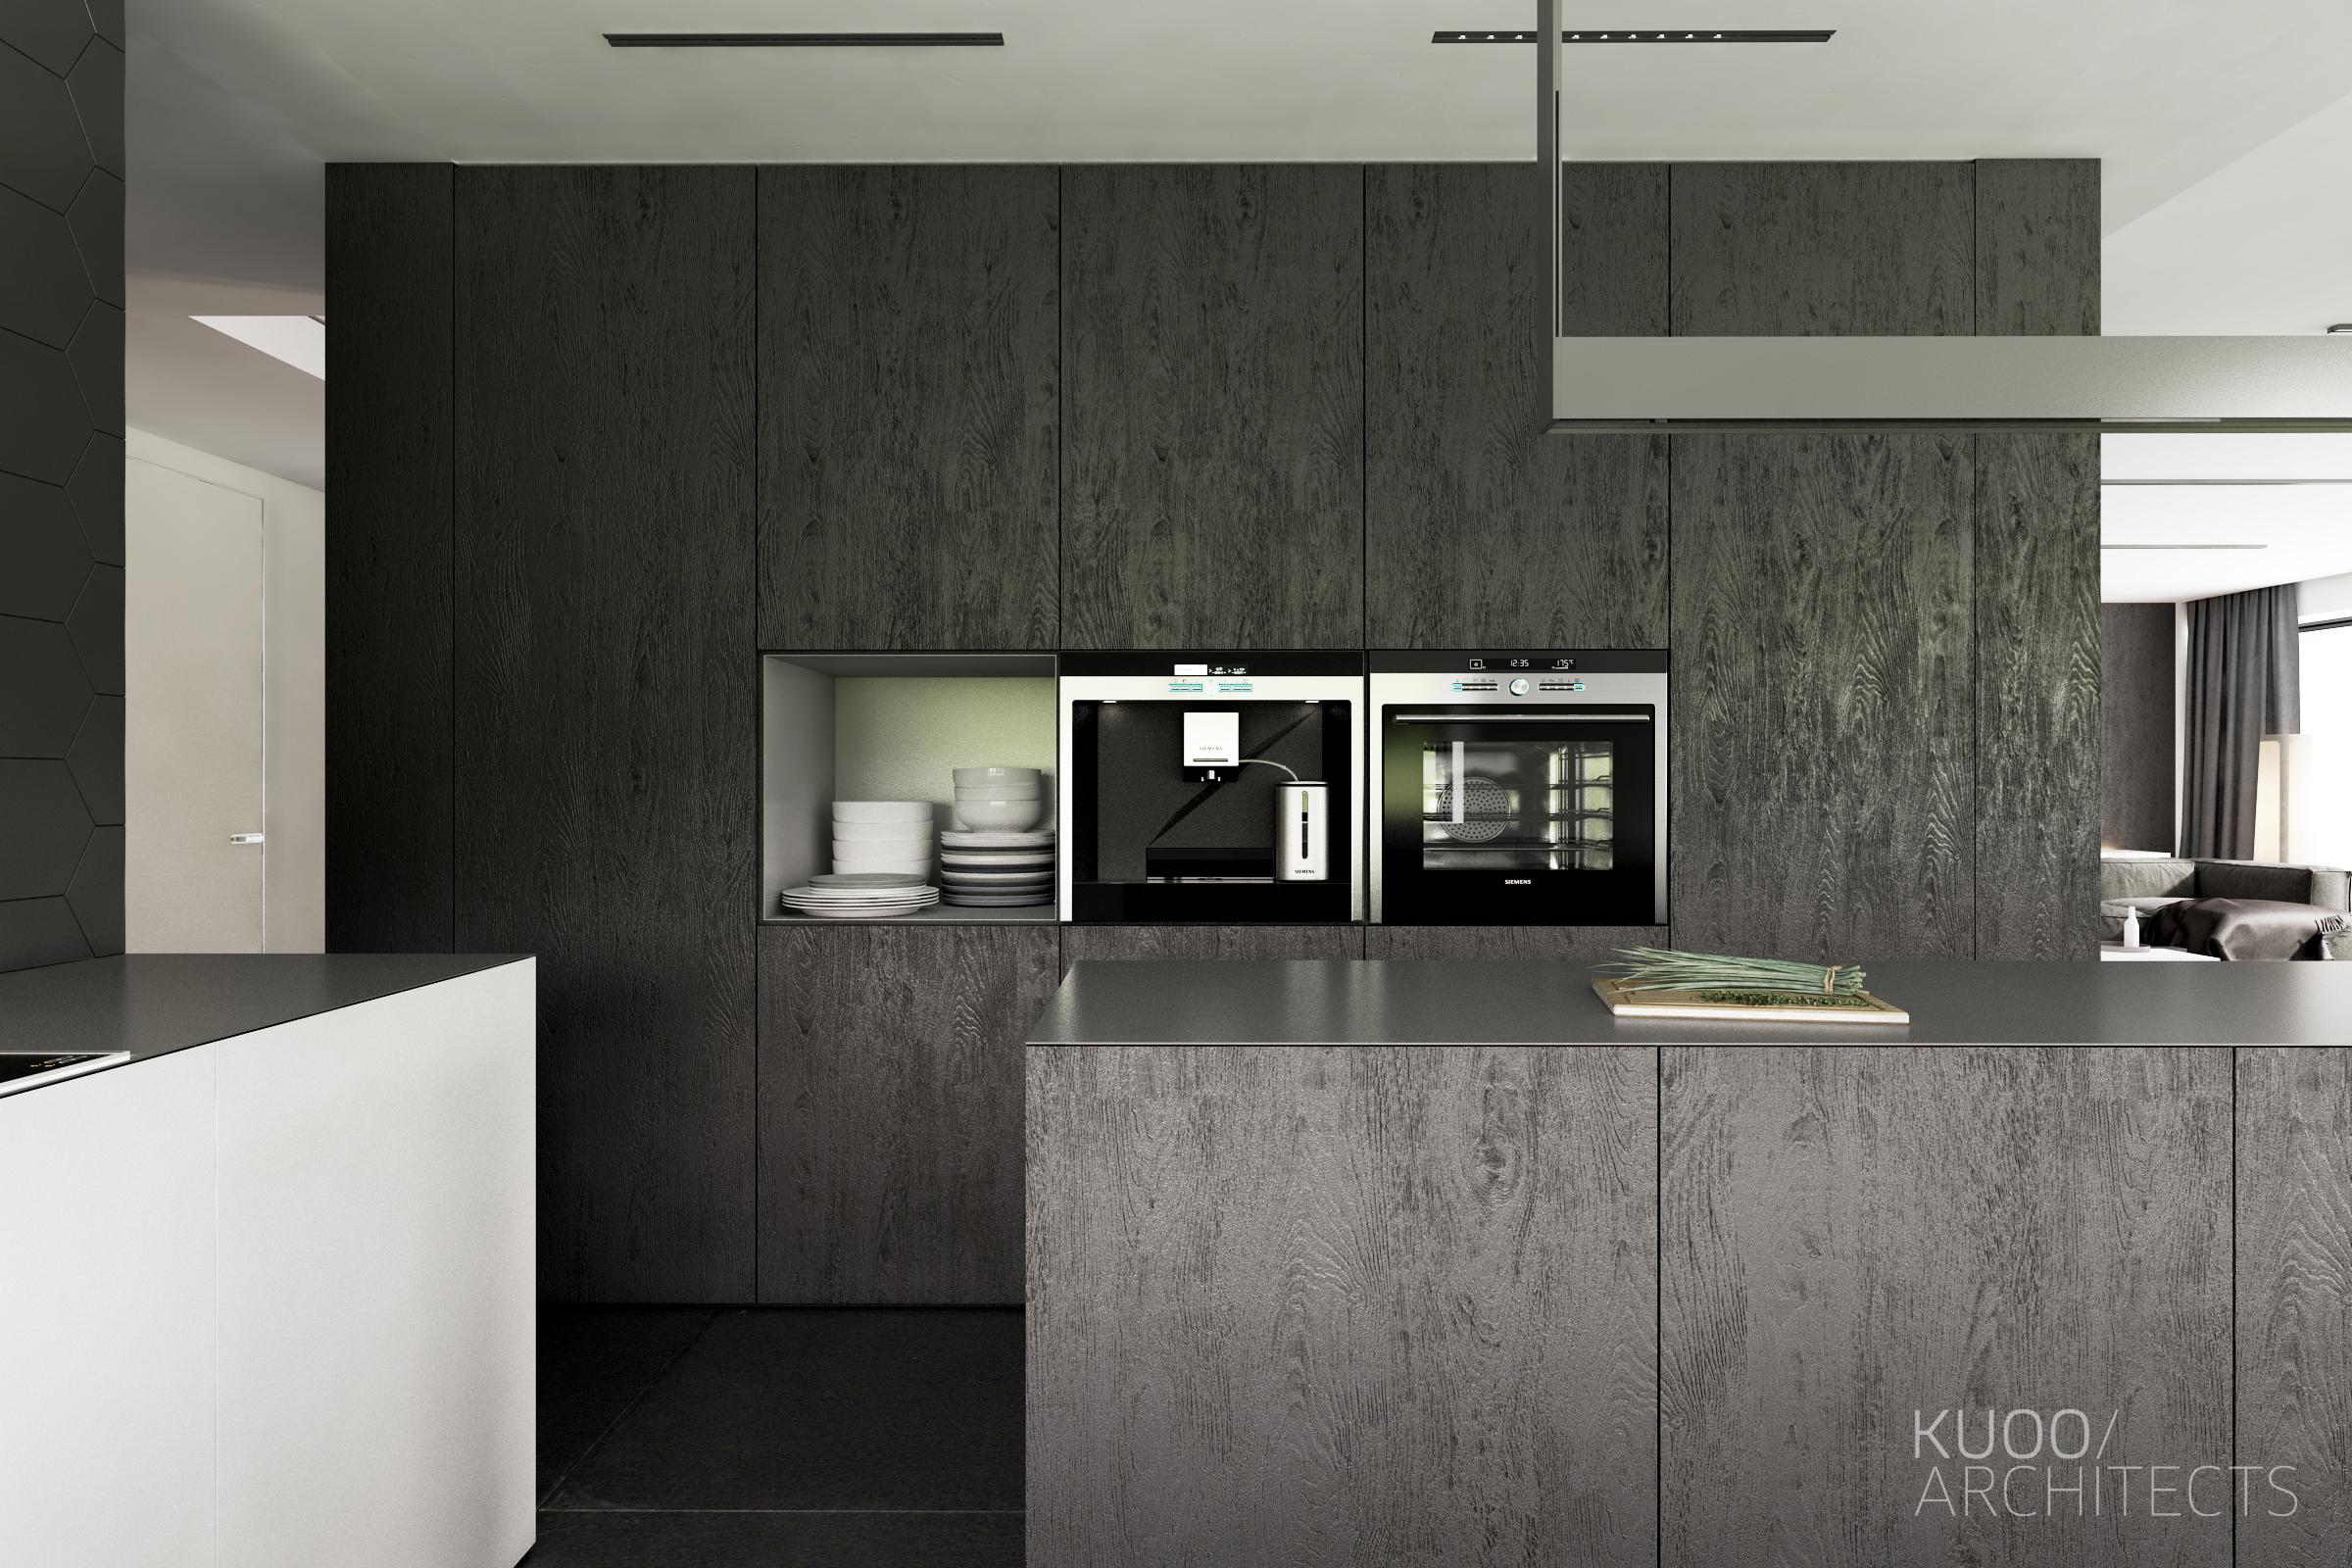 kuoo_architects_interior_design_minimal_contemporary (4) logo